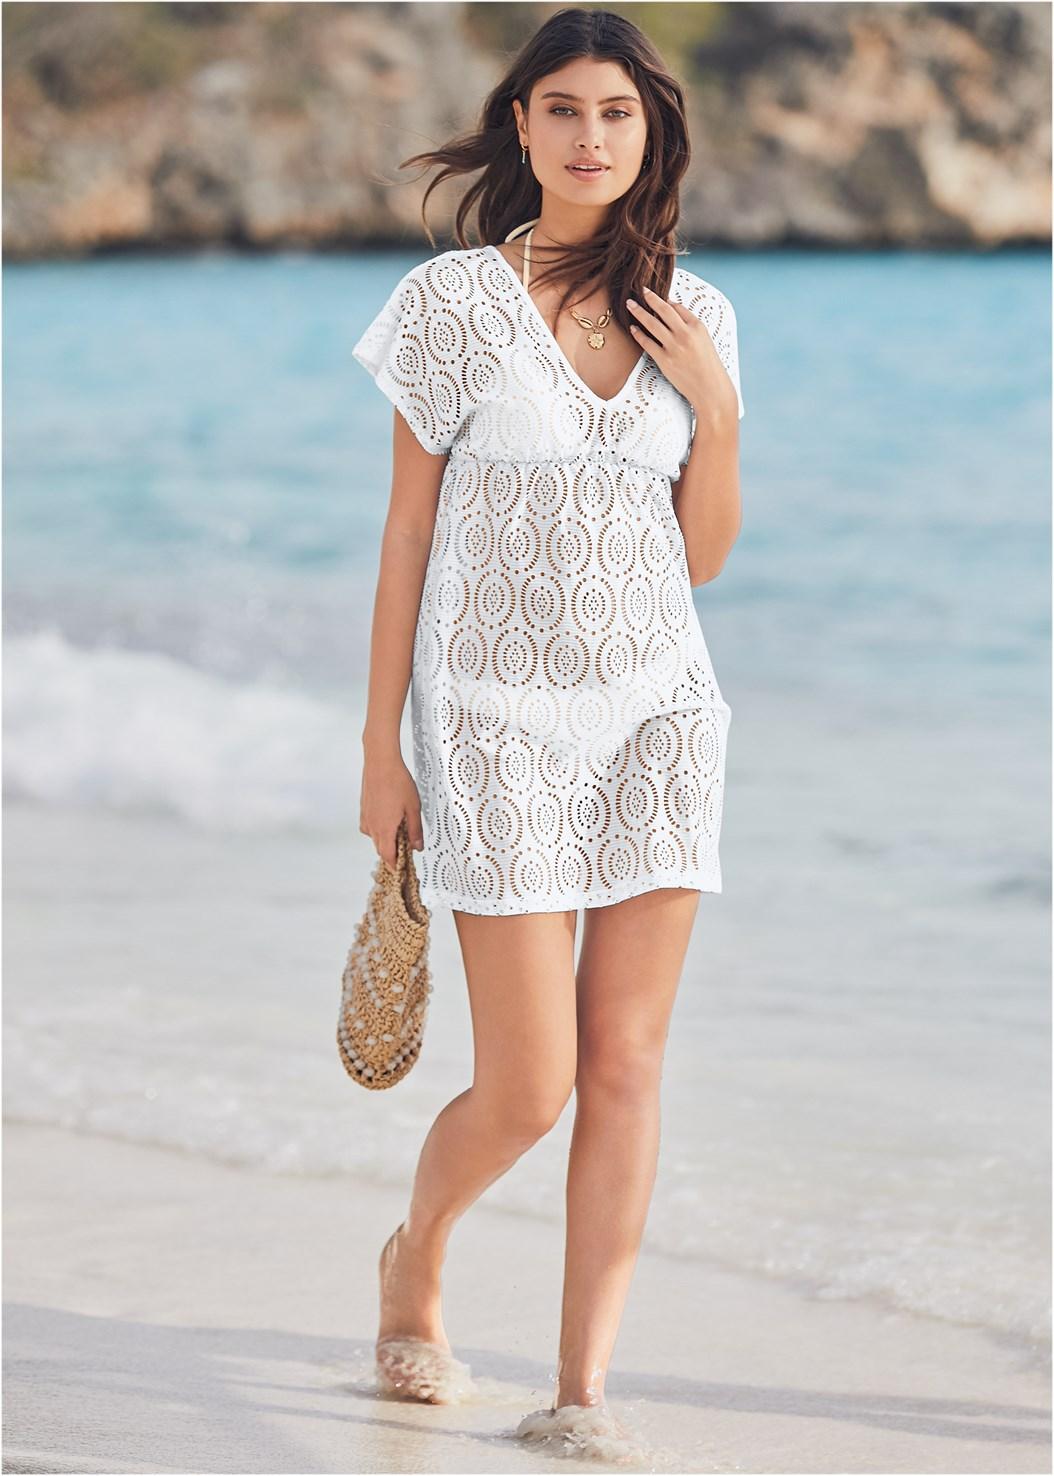 Crochet Dolman Cover-Up,Triangle String Bikini Top,Scoop Front Classic Bikini Bottom